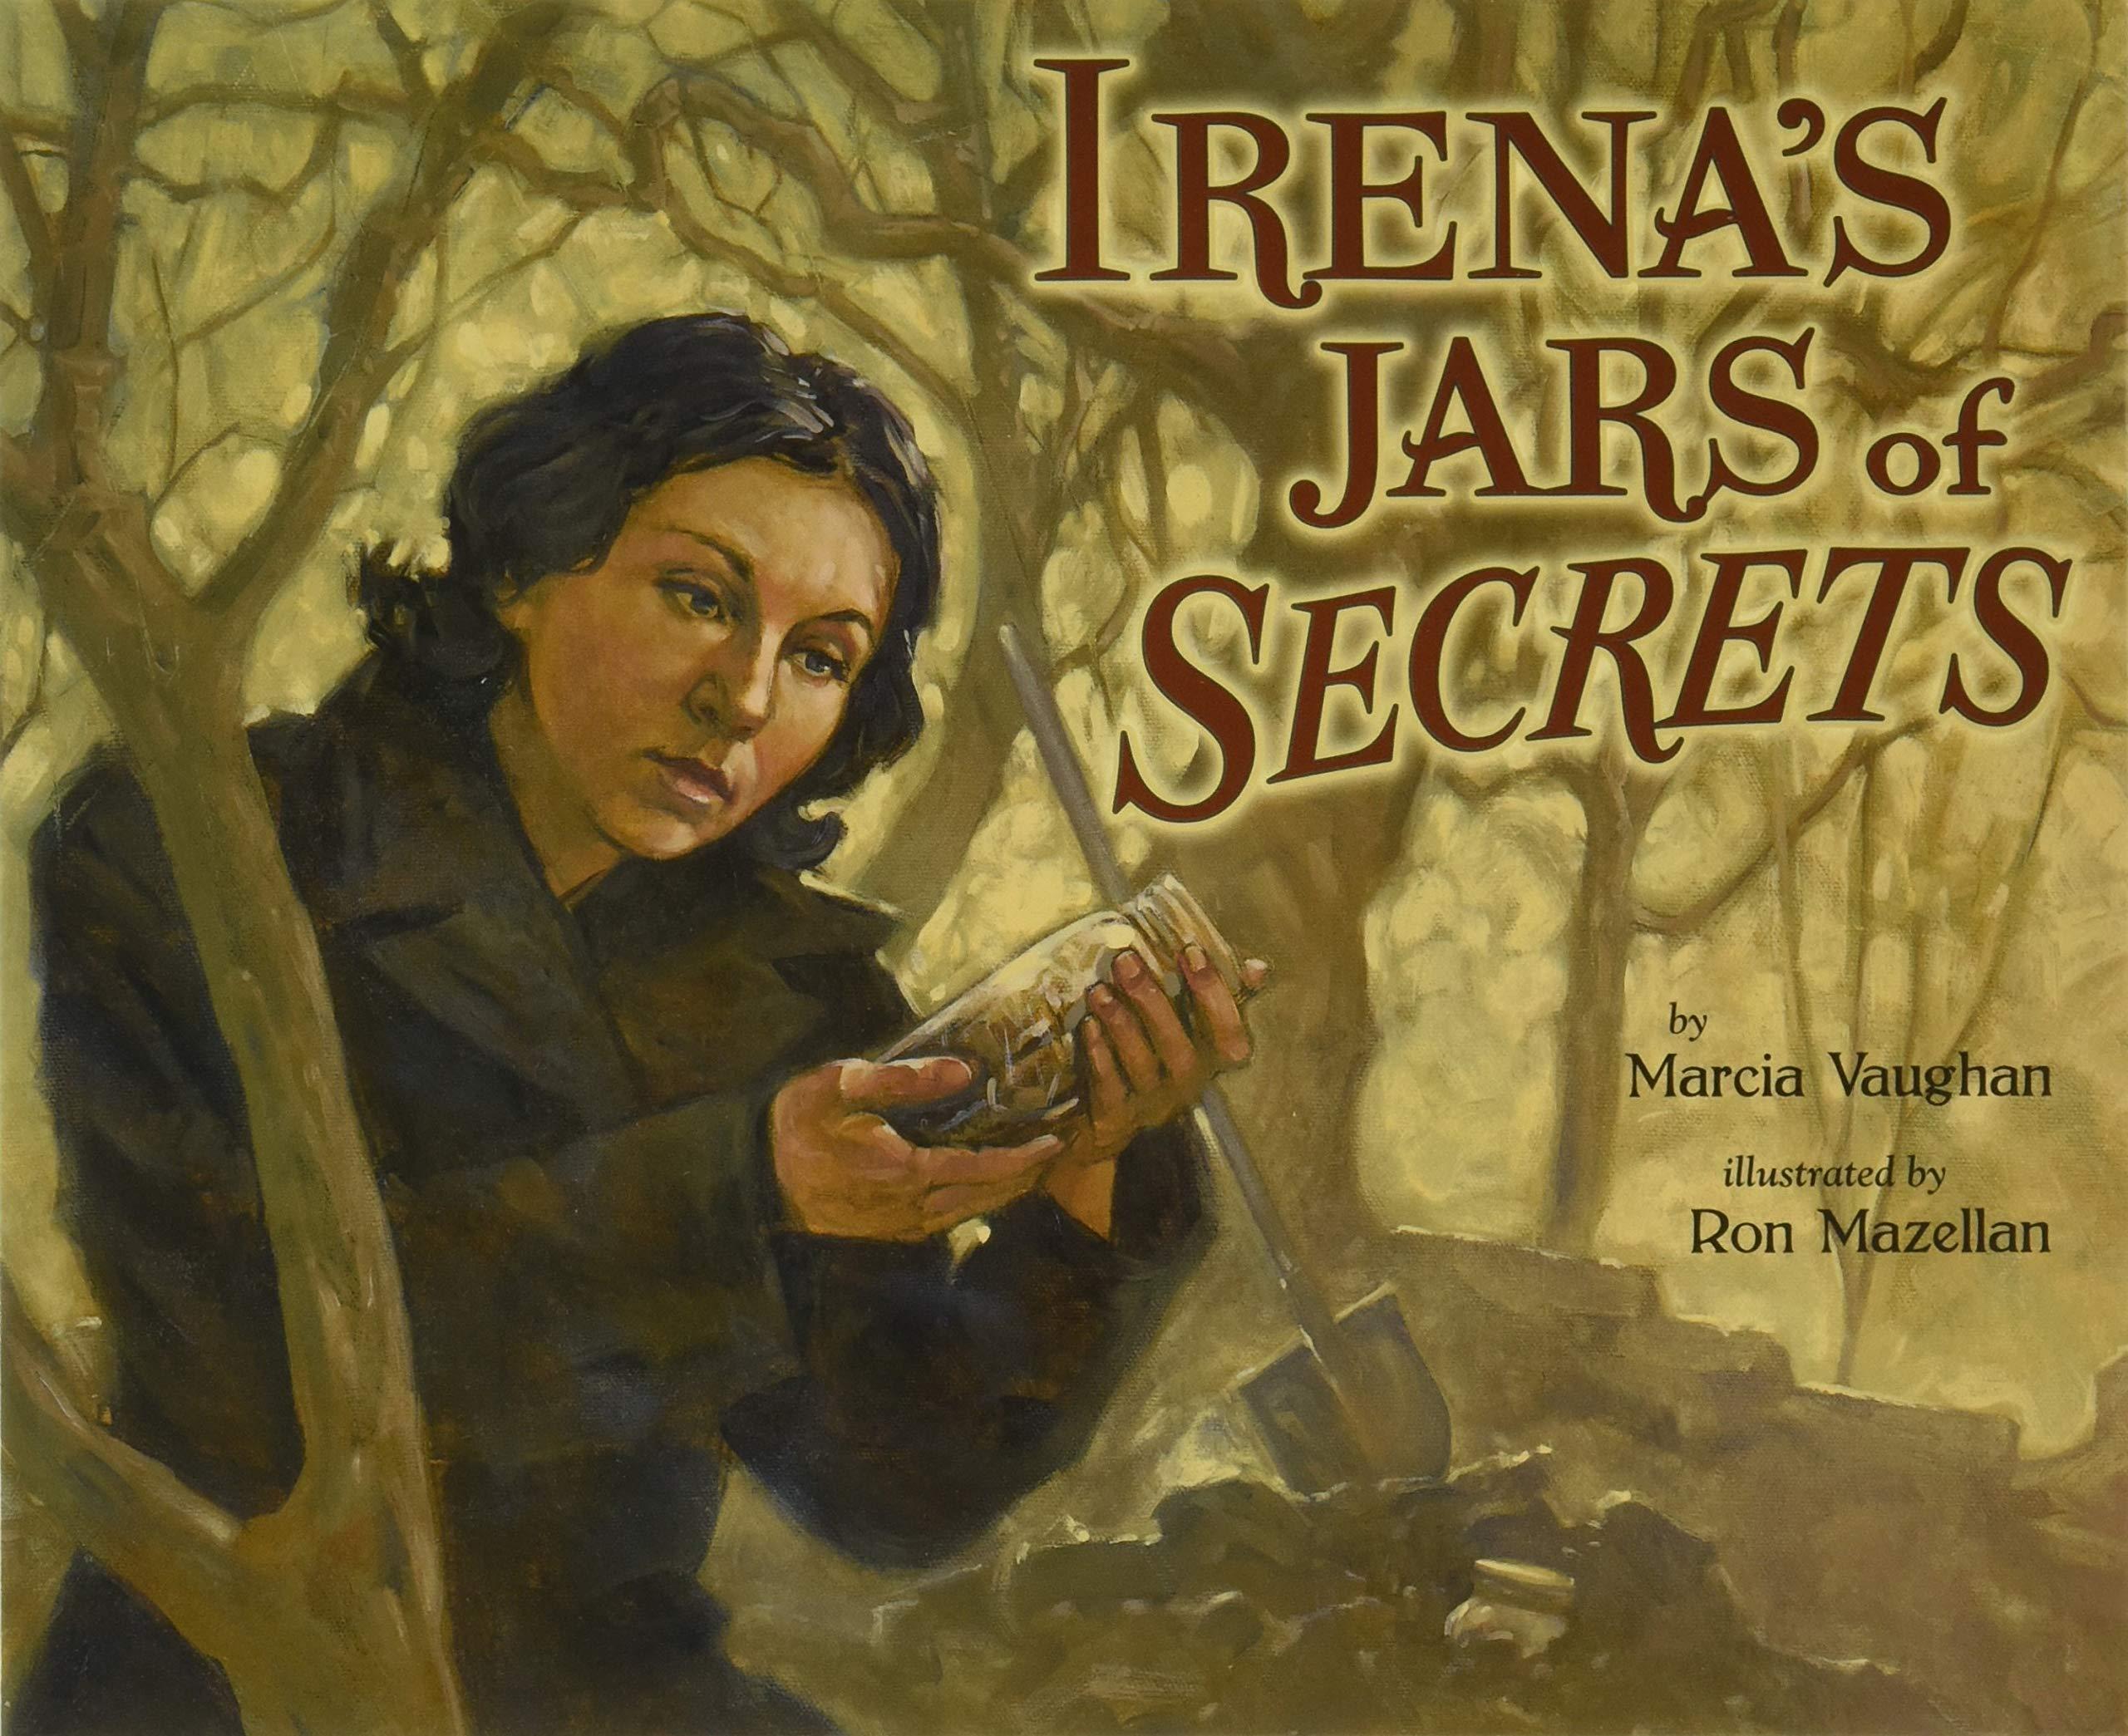 Irena S Jars of Secrets: Amazon.es: Vaughan, Marcia, Mazellan ...